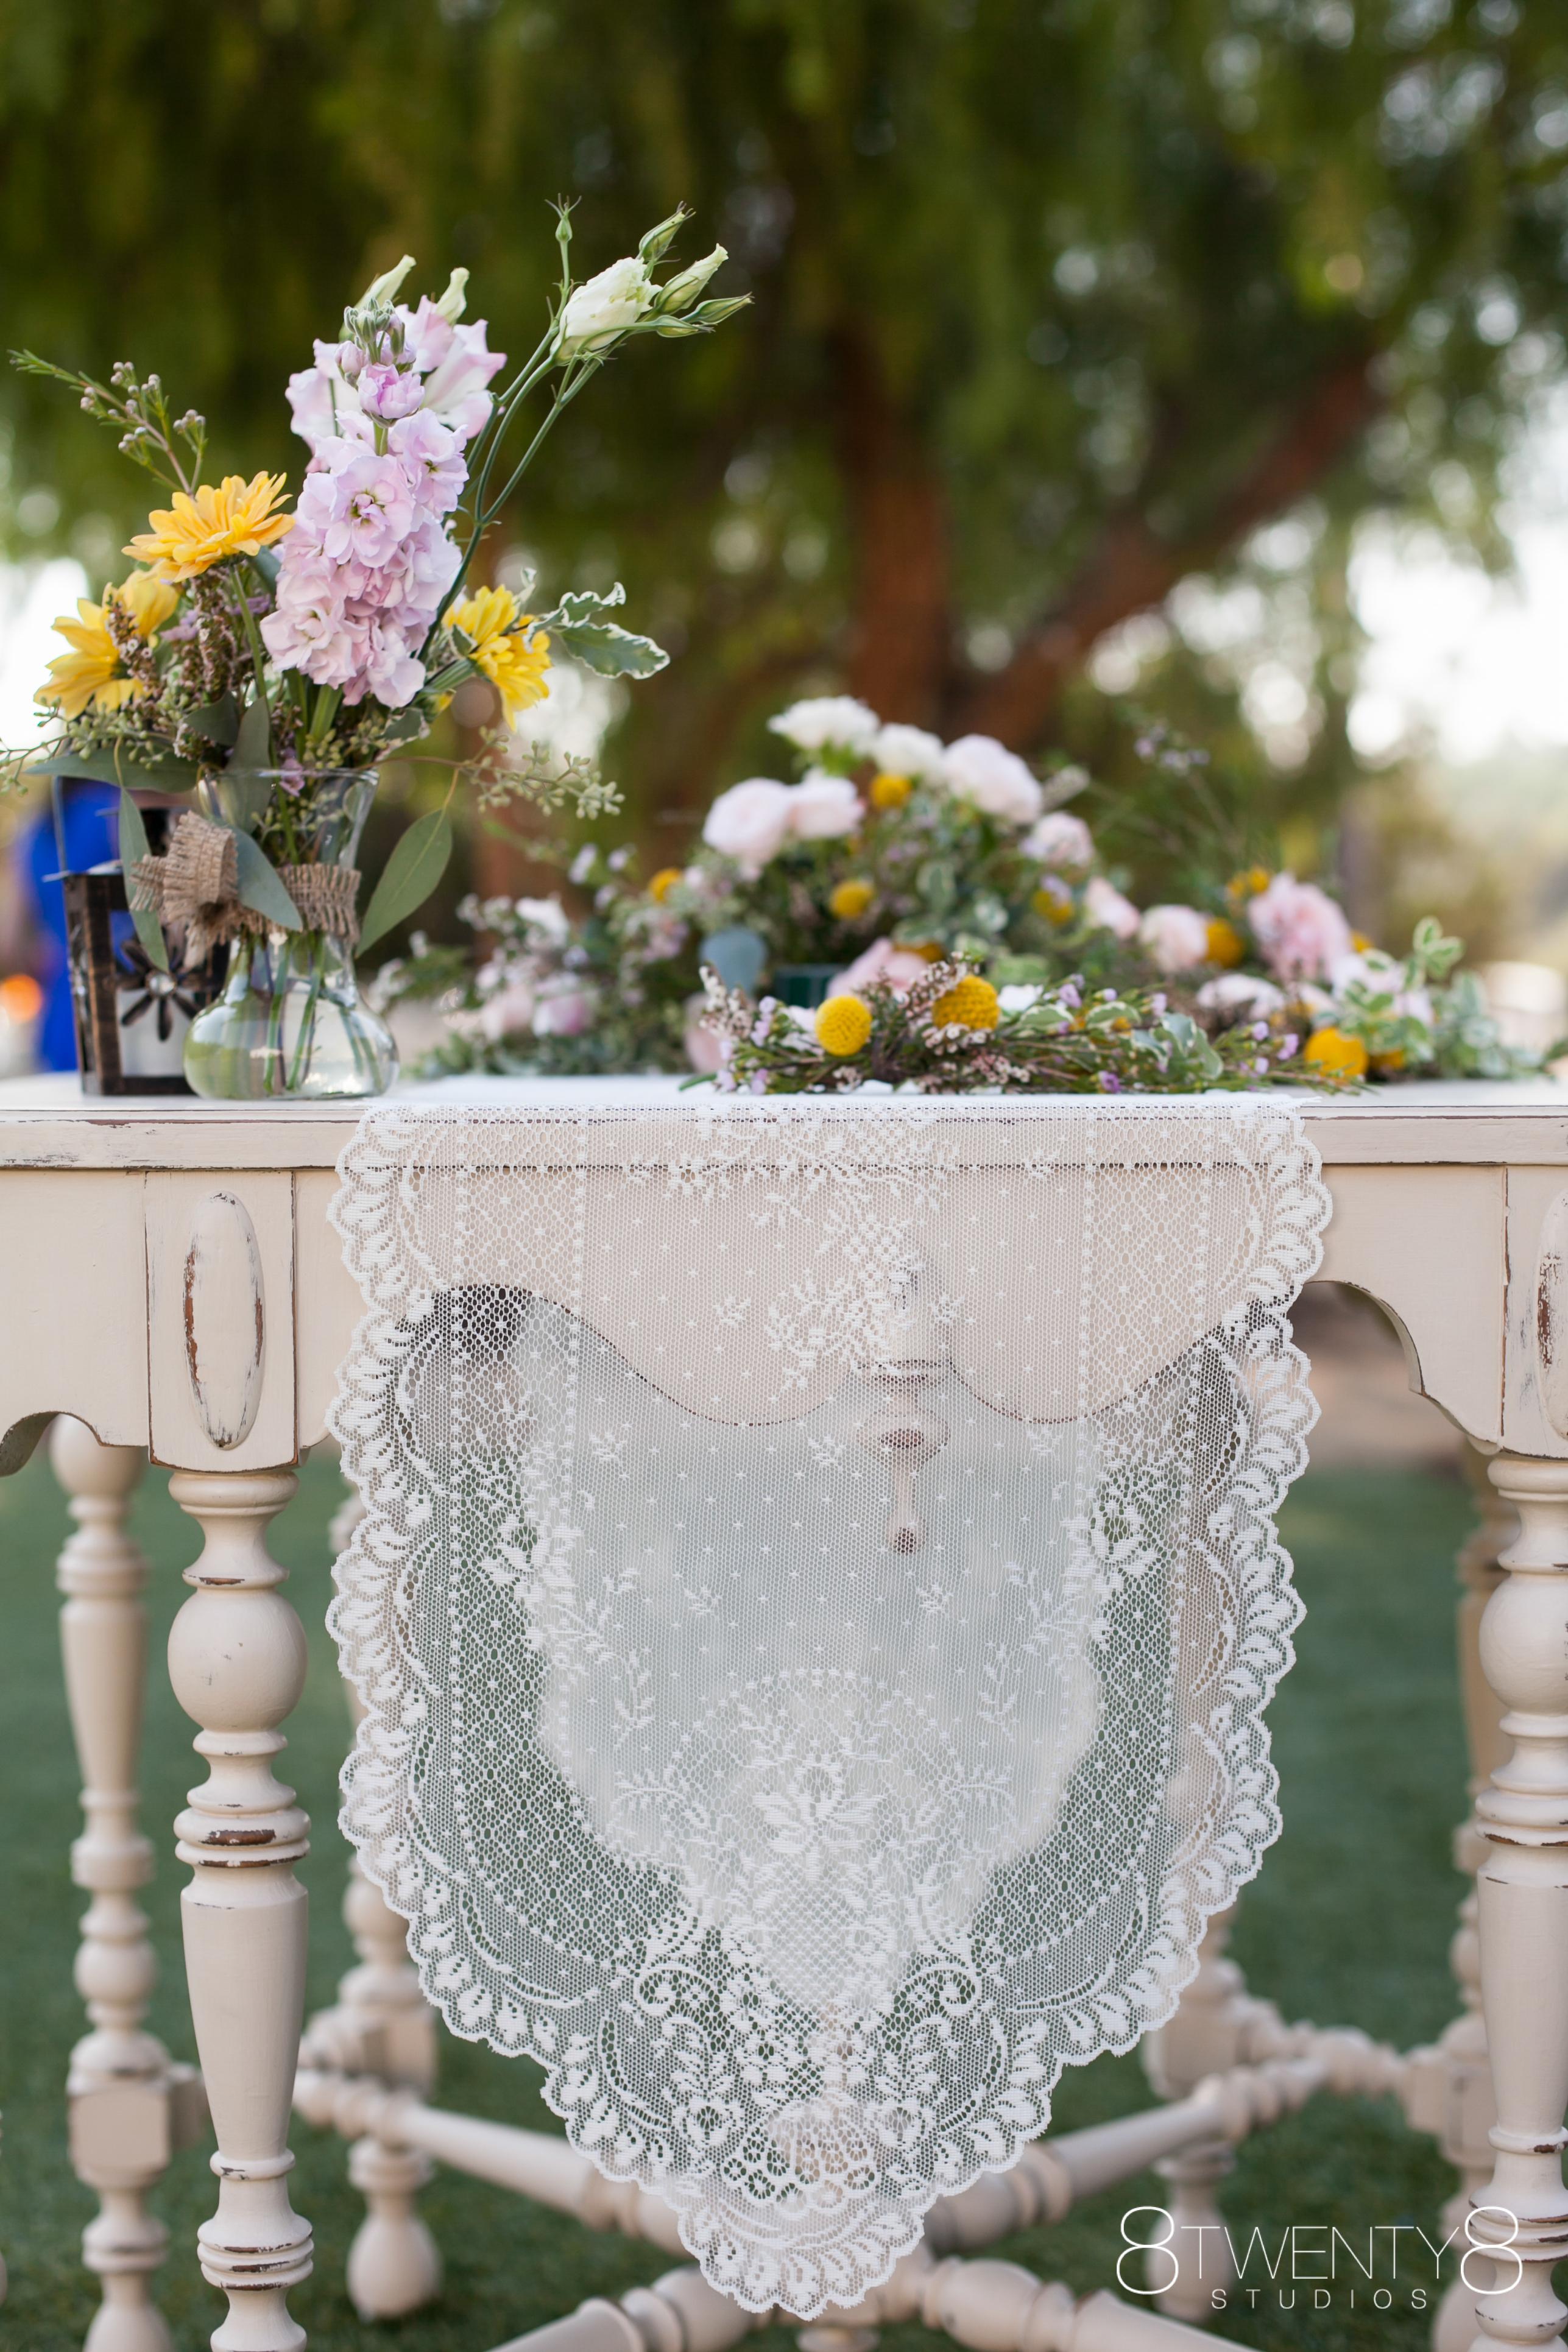 0363-130914-brianne-josh-wedding--¬8twenty8-Studios